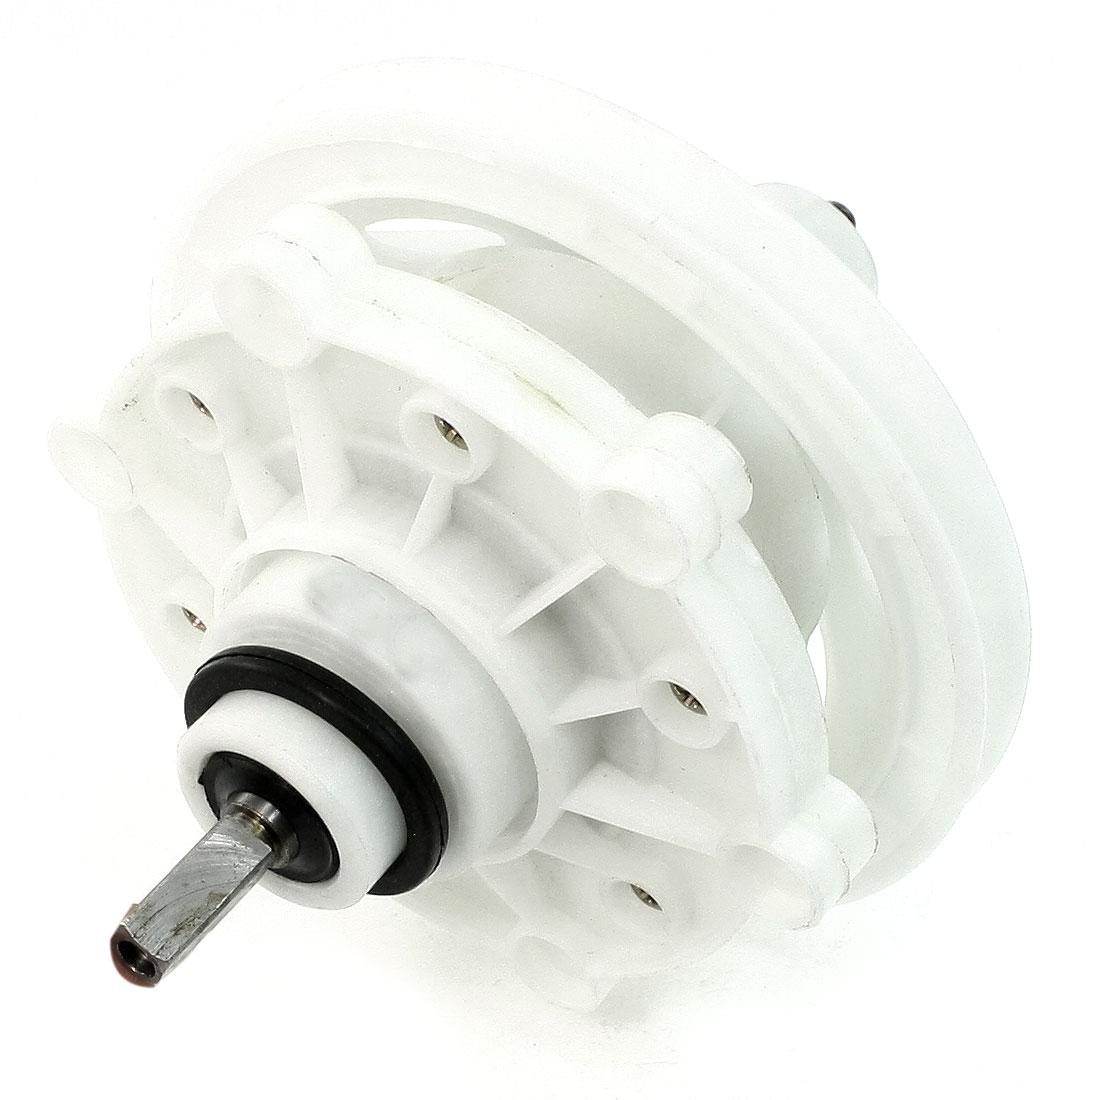 Replacement 5.5mm Inner Thread Shaft Washing Machine Washer Gear Reducer